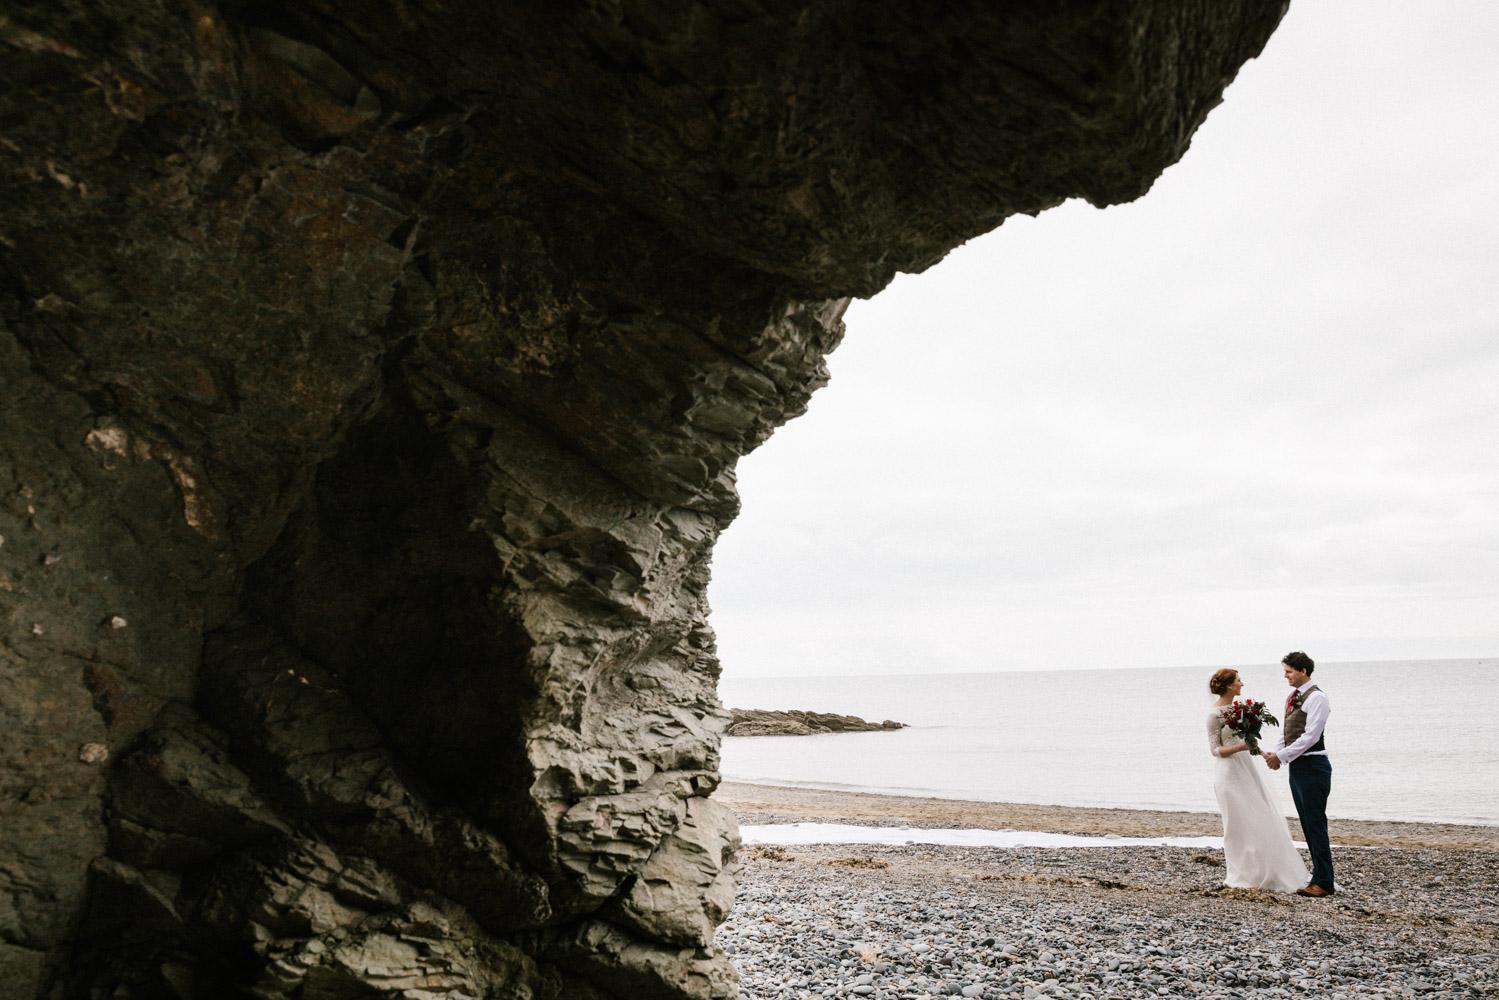 Clairebyrnephotography-beach-rathsallgh (9 of 23).jpg